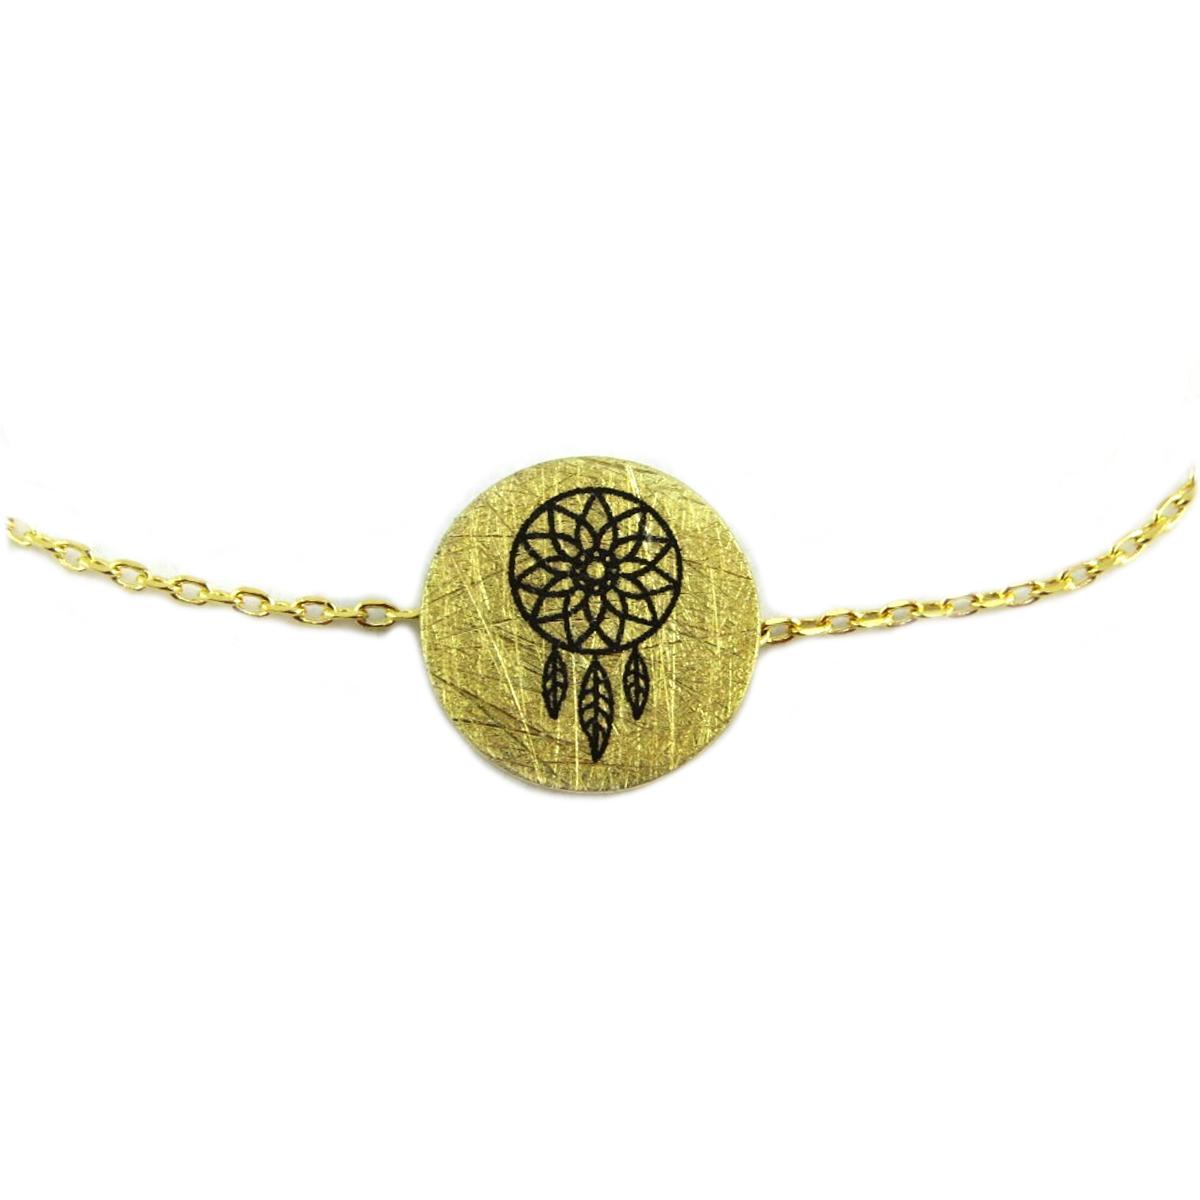 Bracelet artisanal \'Boho\' doré (dreamcatcher) -  12x12 mm - [Q6072]